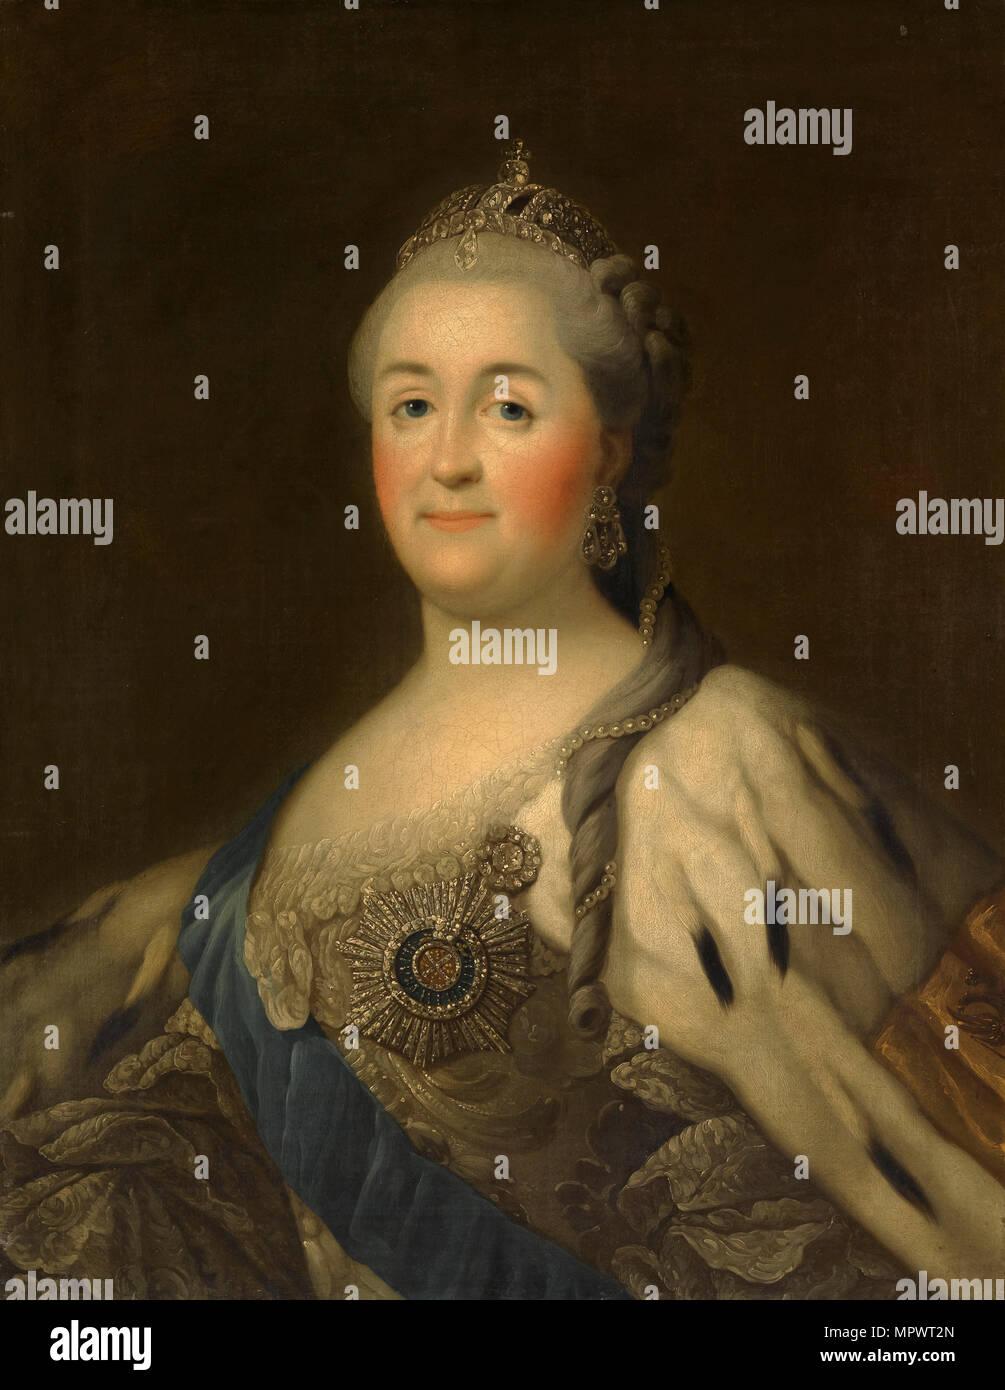 Portrait of Empress Catherine II (1729-1796), . - Stock Image